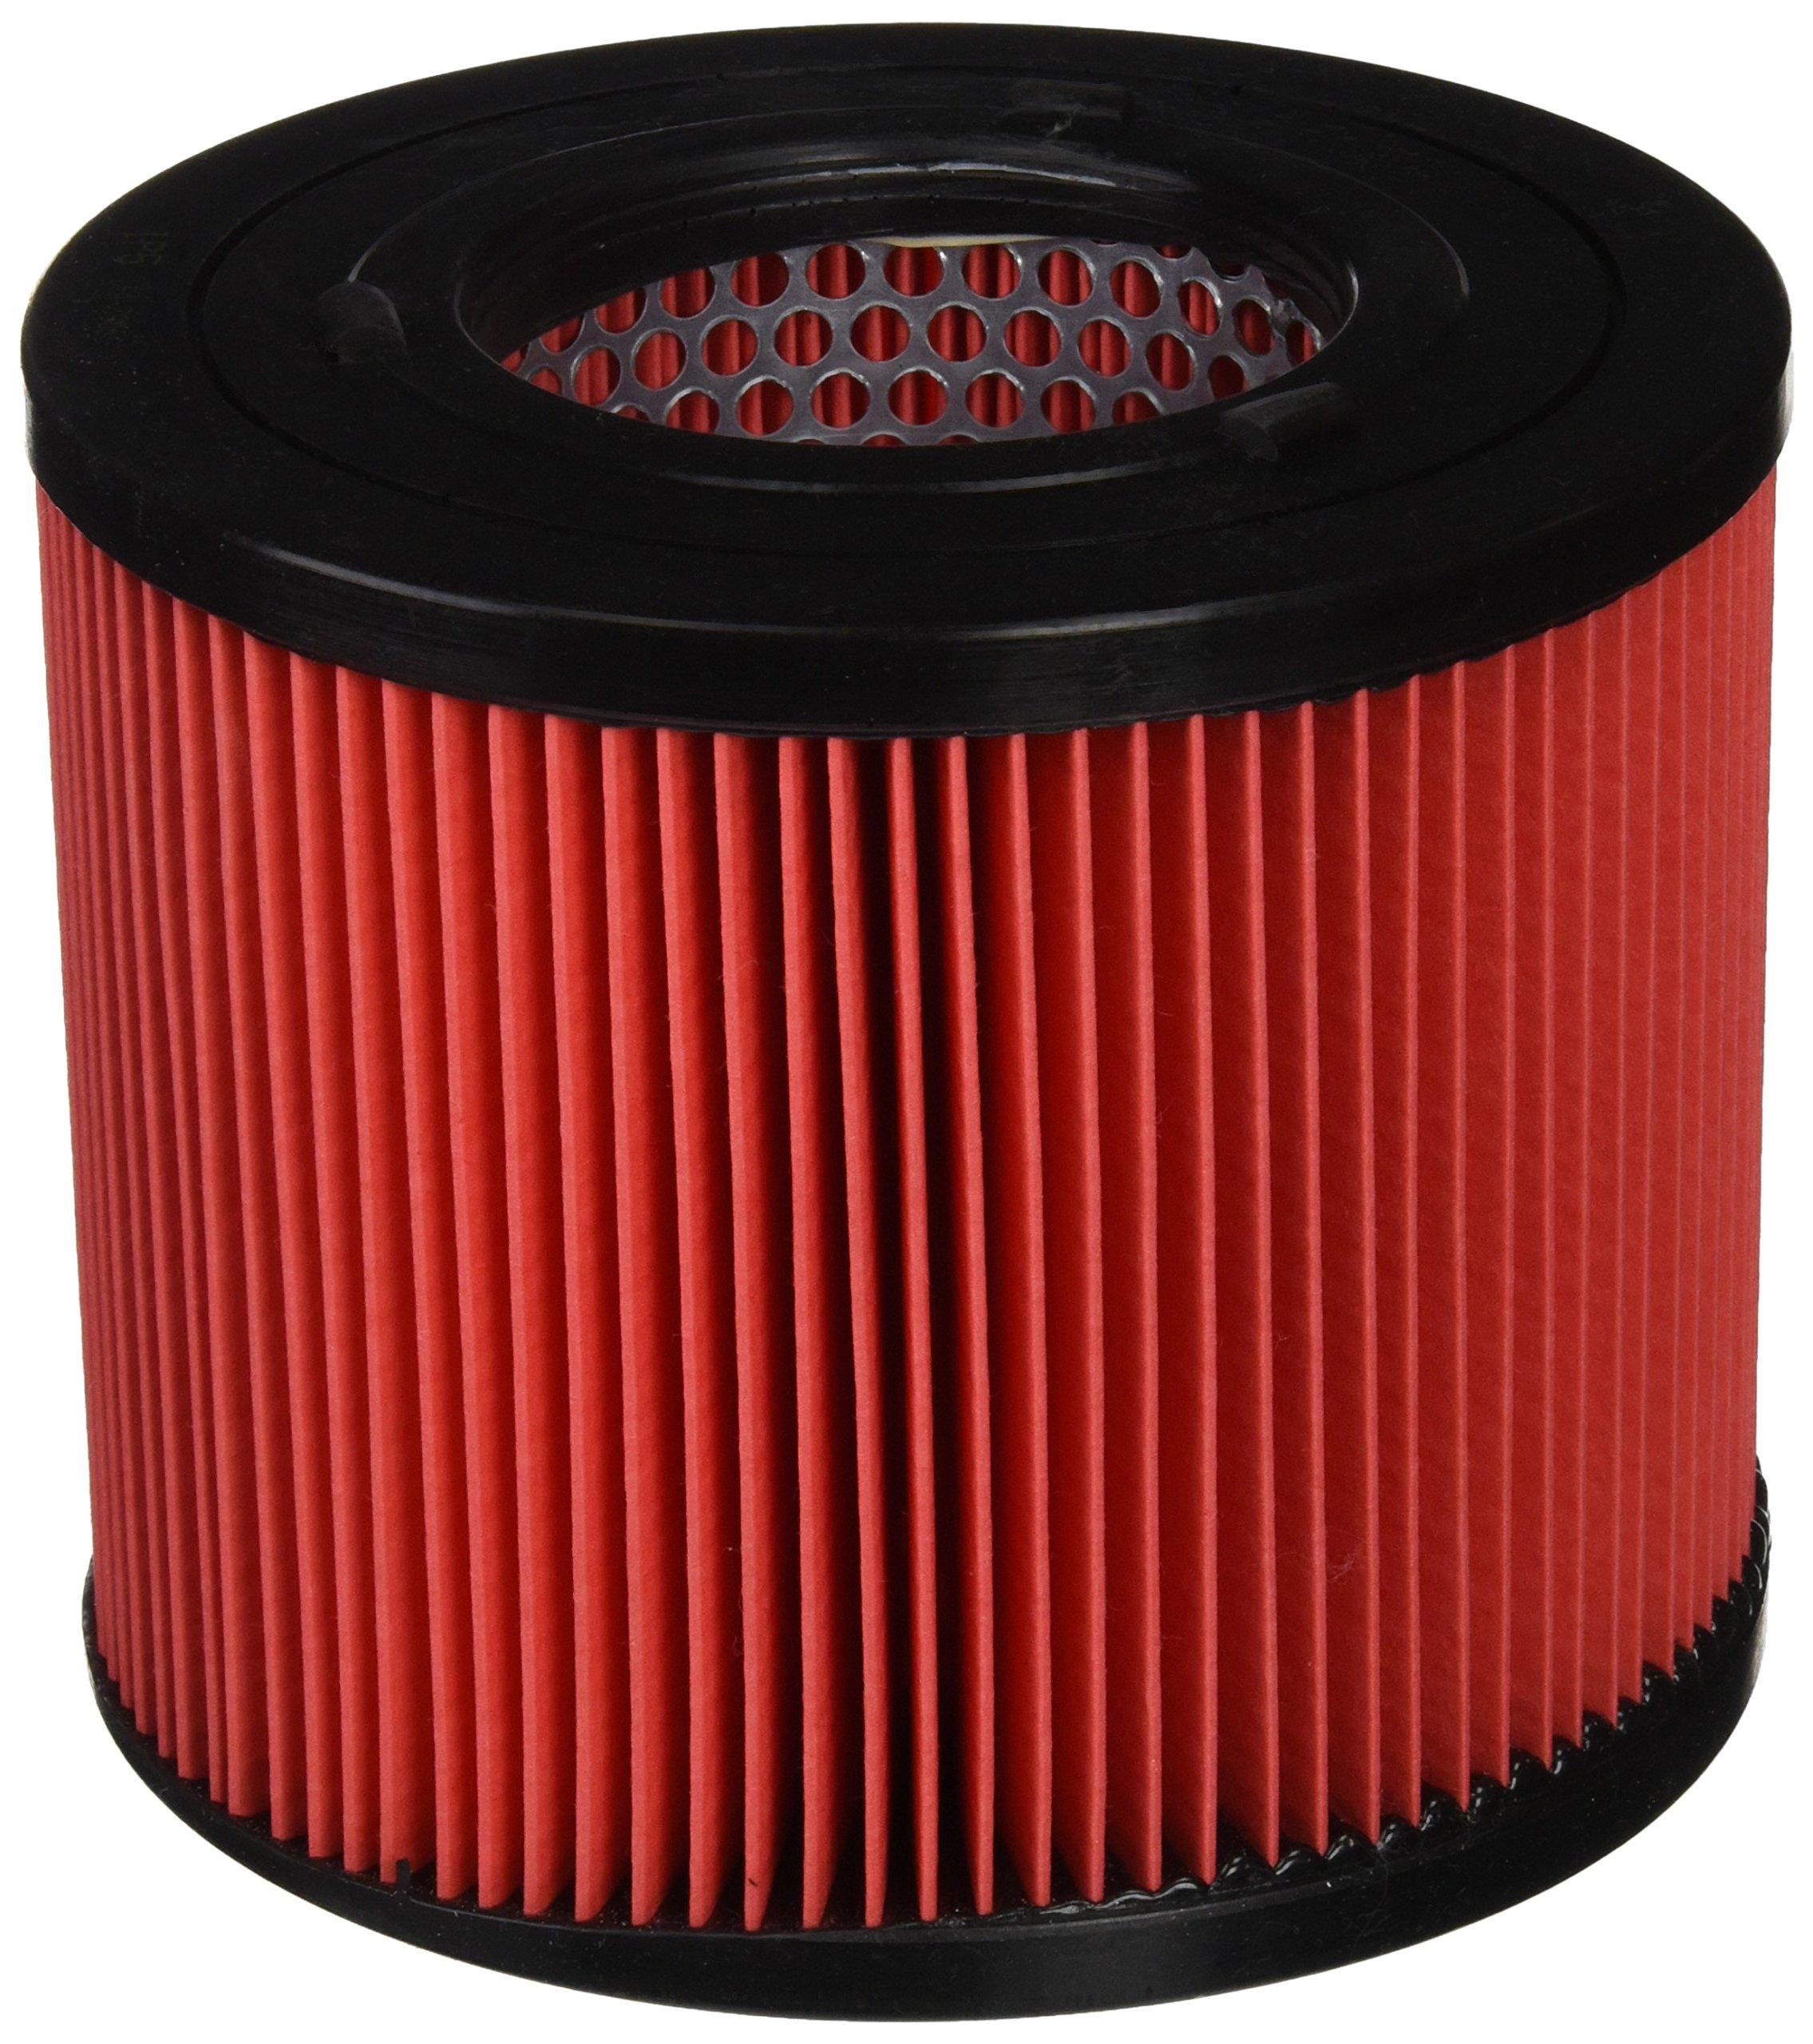 IPS PART j|ifa-3906Air Filter